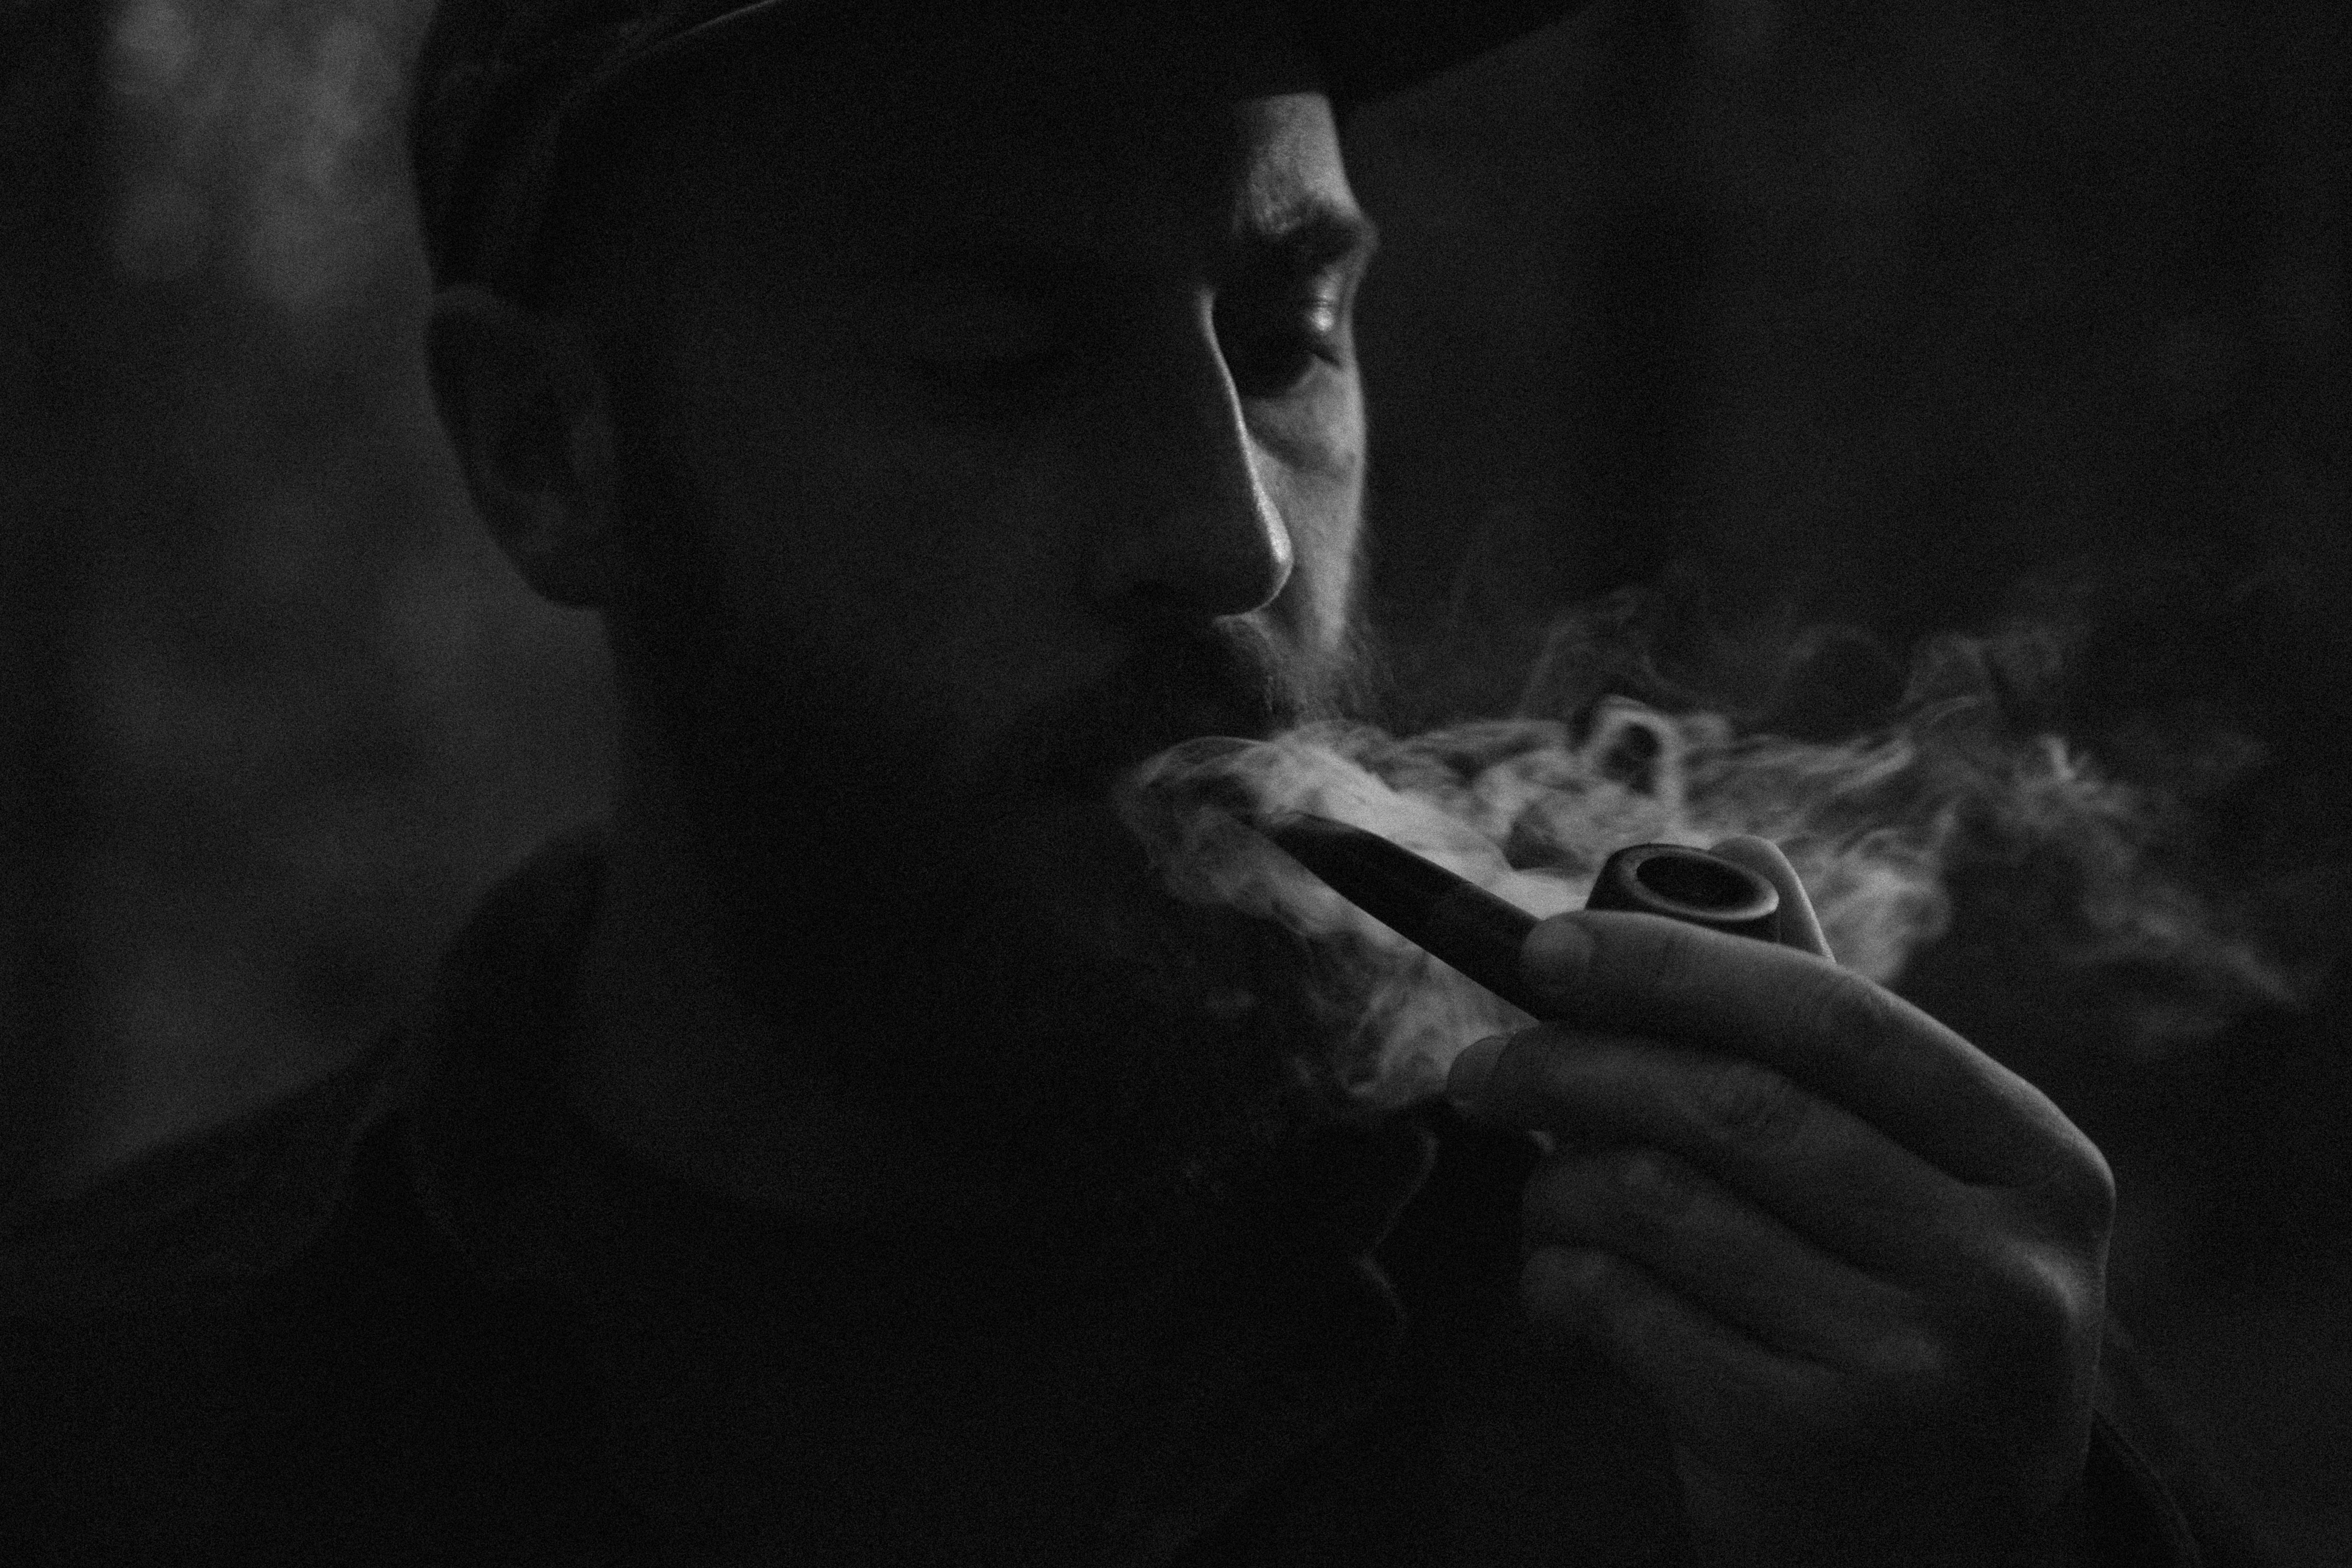 парень курит фото картинка